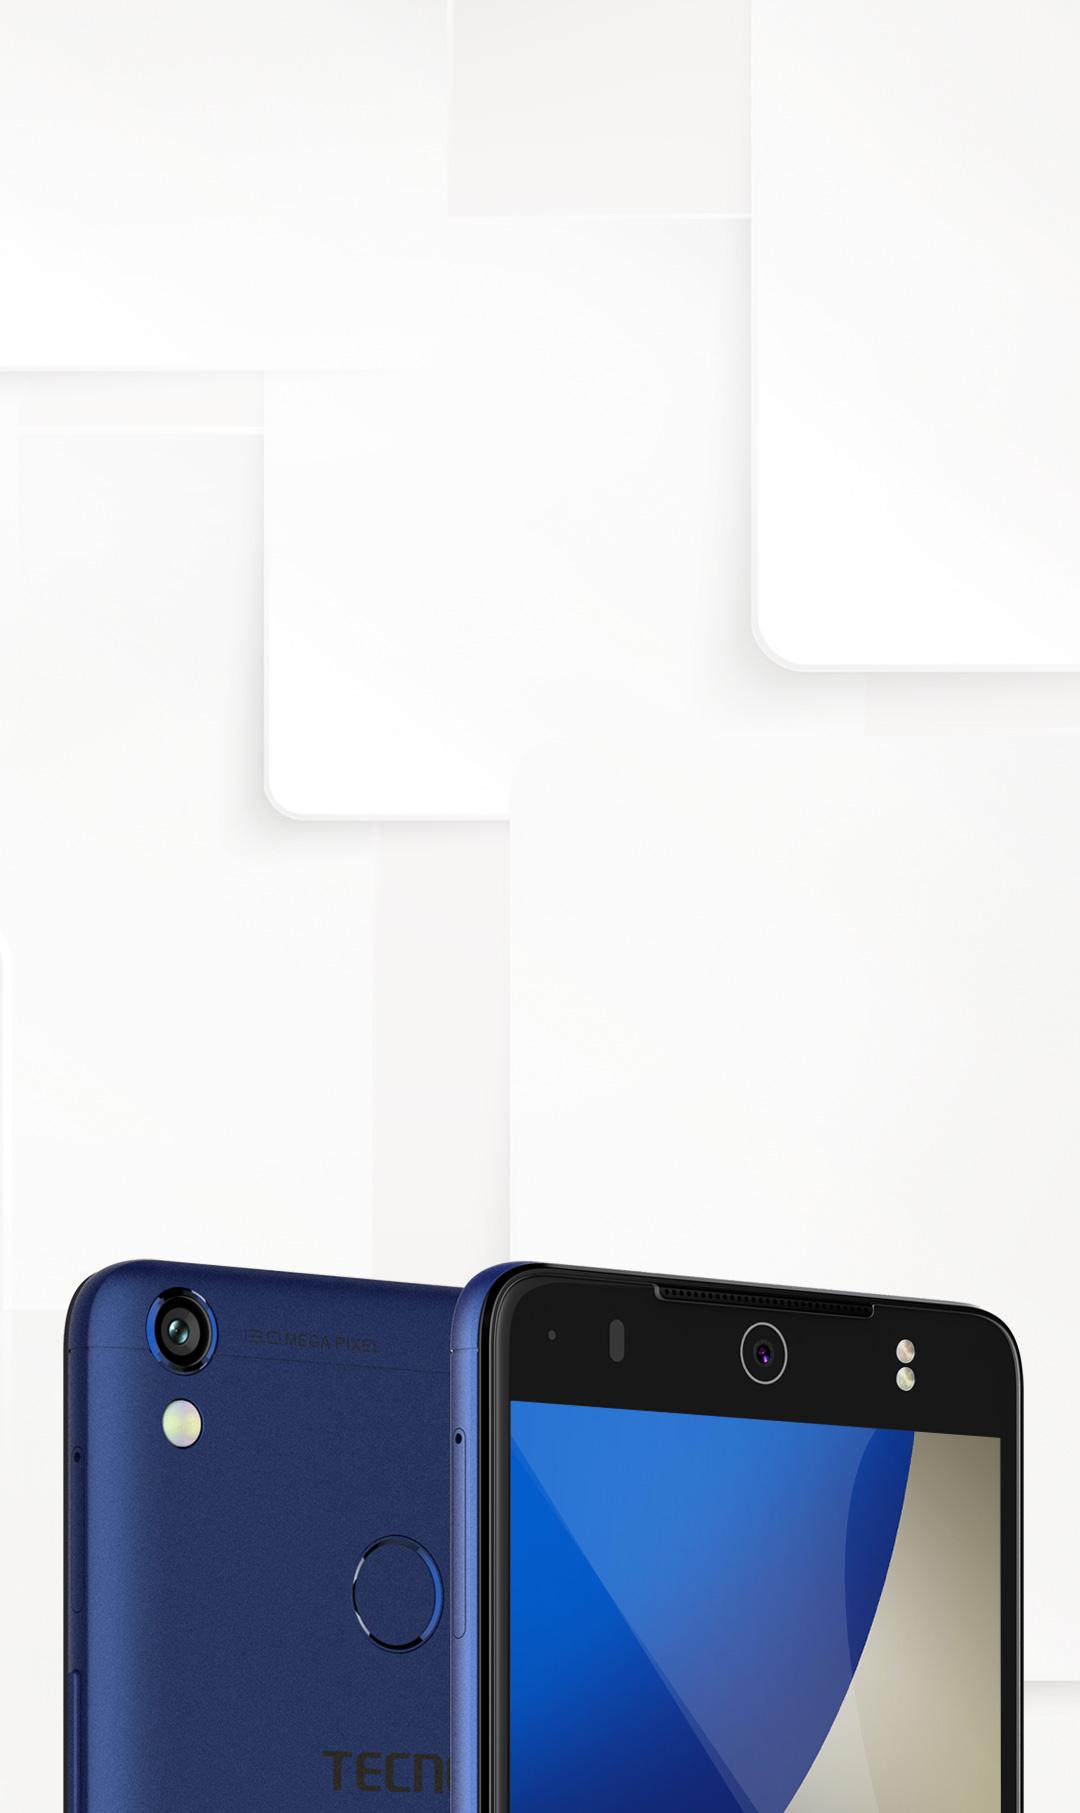 Camon CX Air - TECNO Mobile